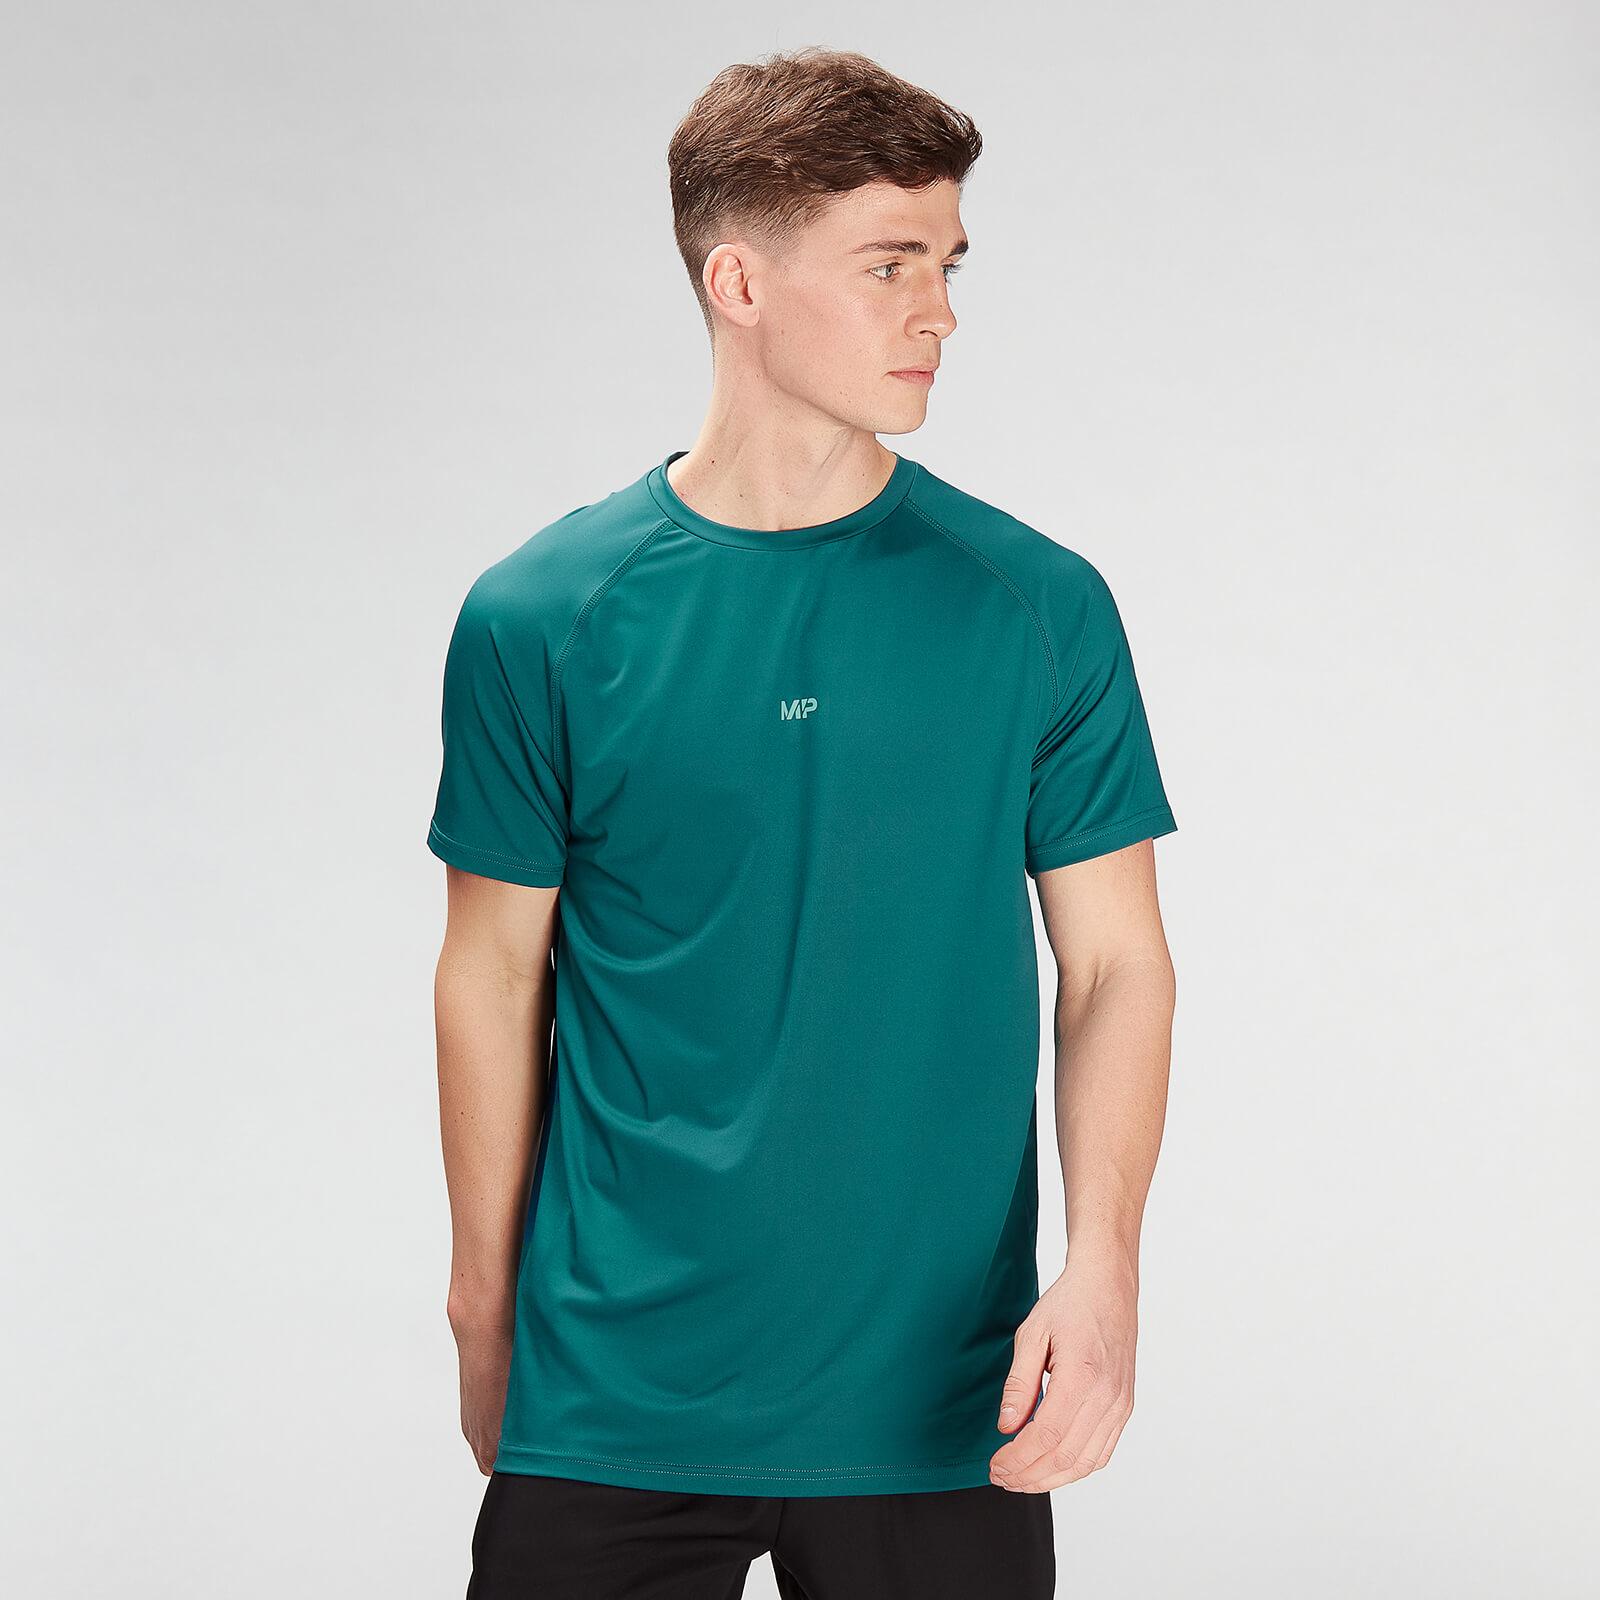 Купить MP Men's Limited Edition Impact Short Sleeve T-Shirt - Teal - XXL, Myprotein International